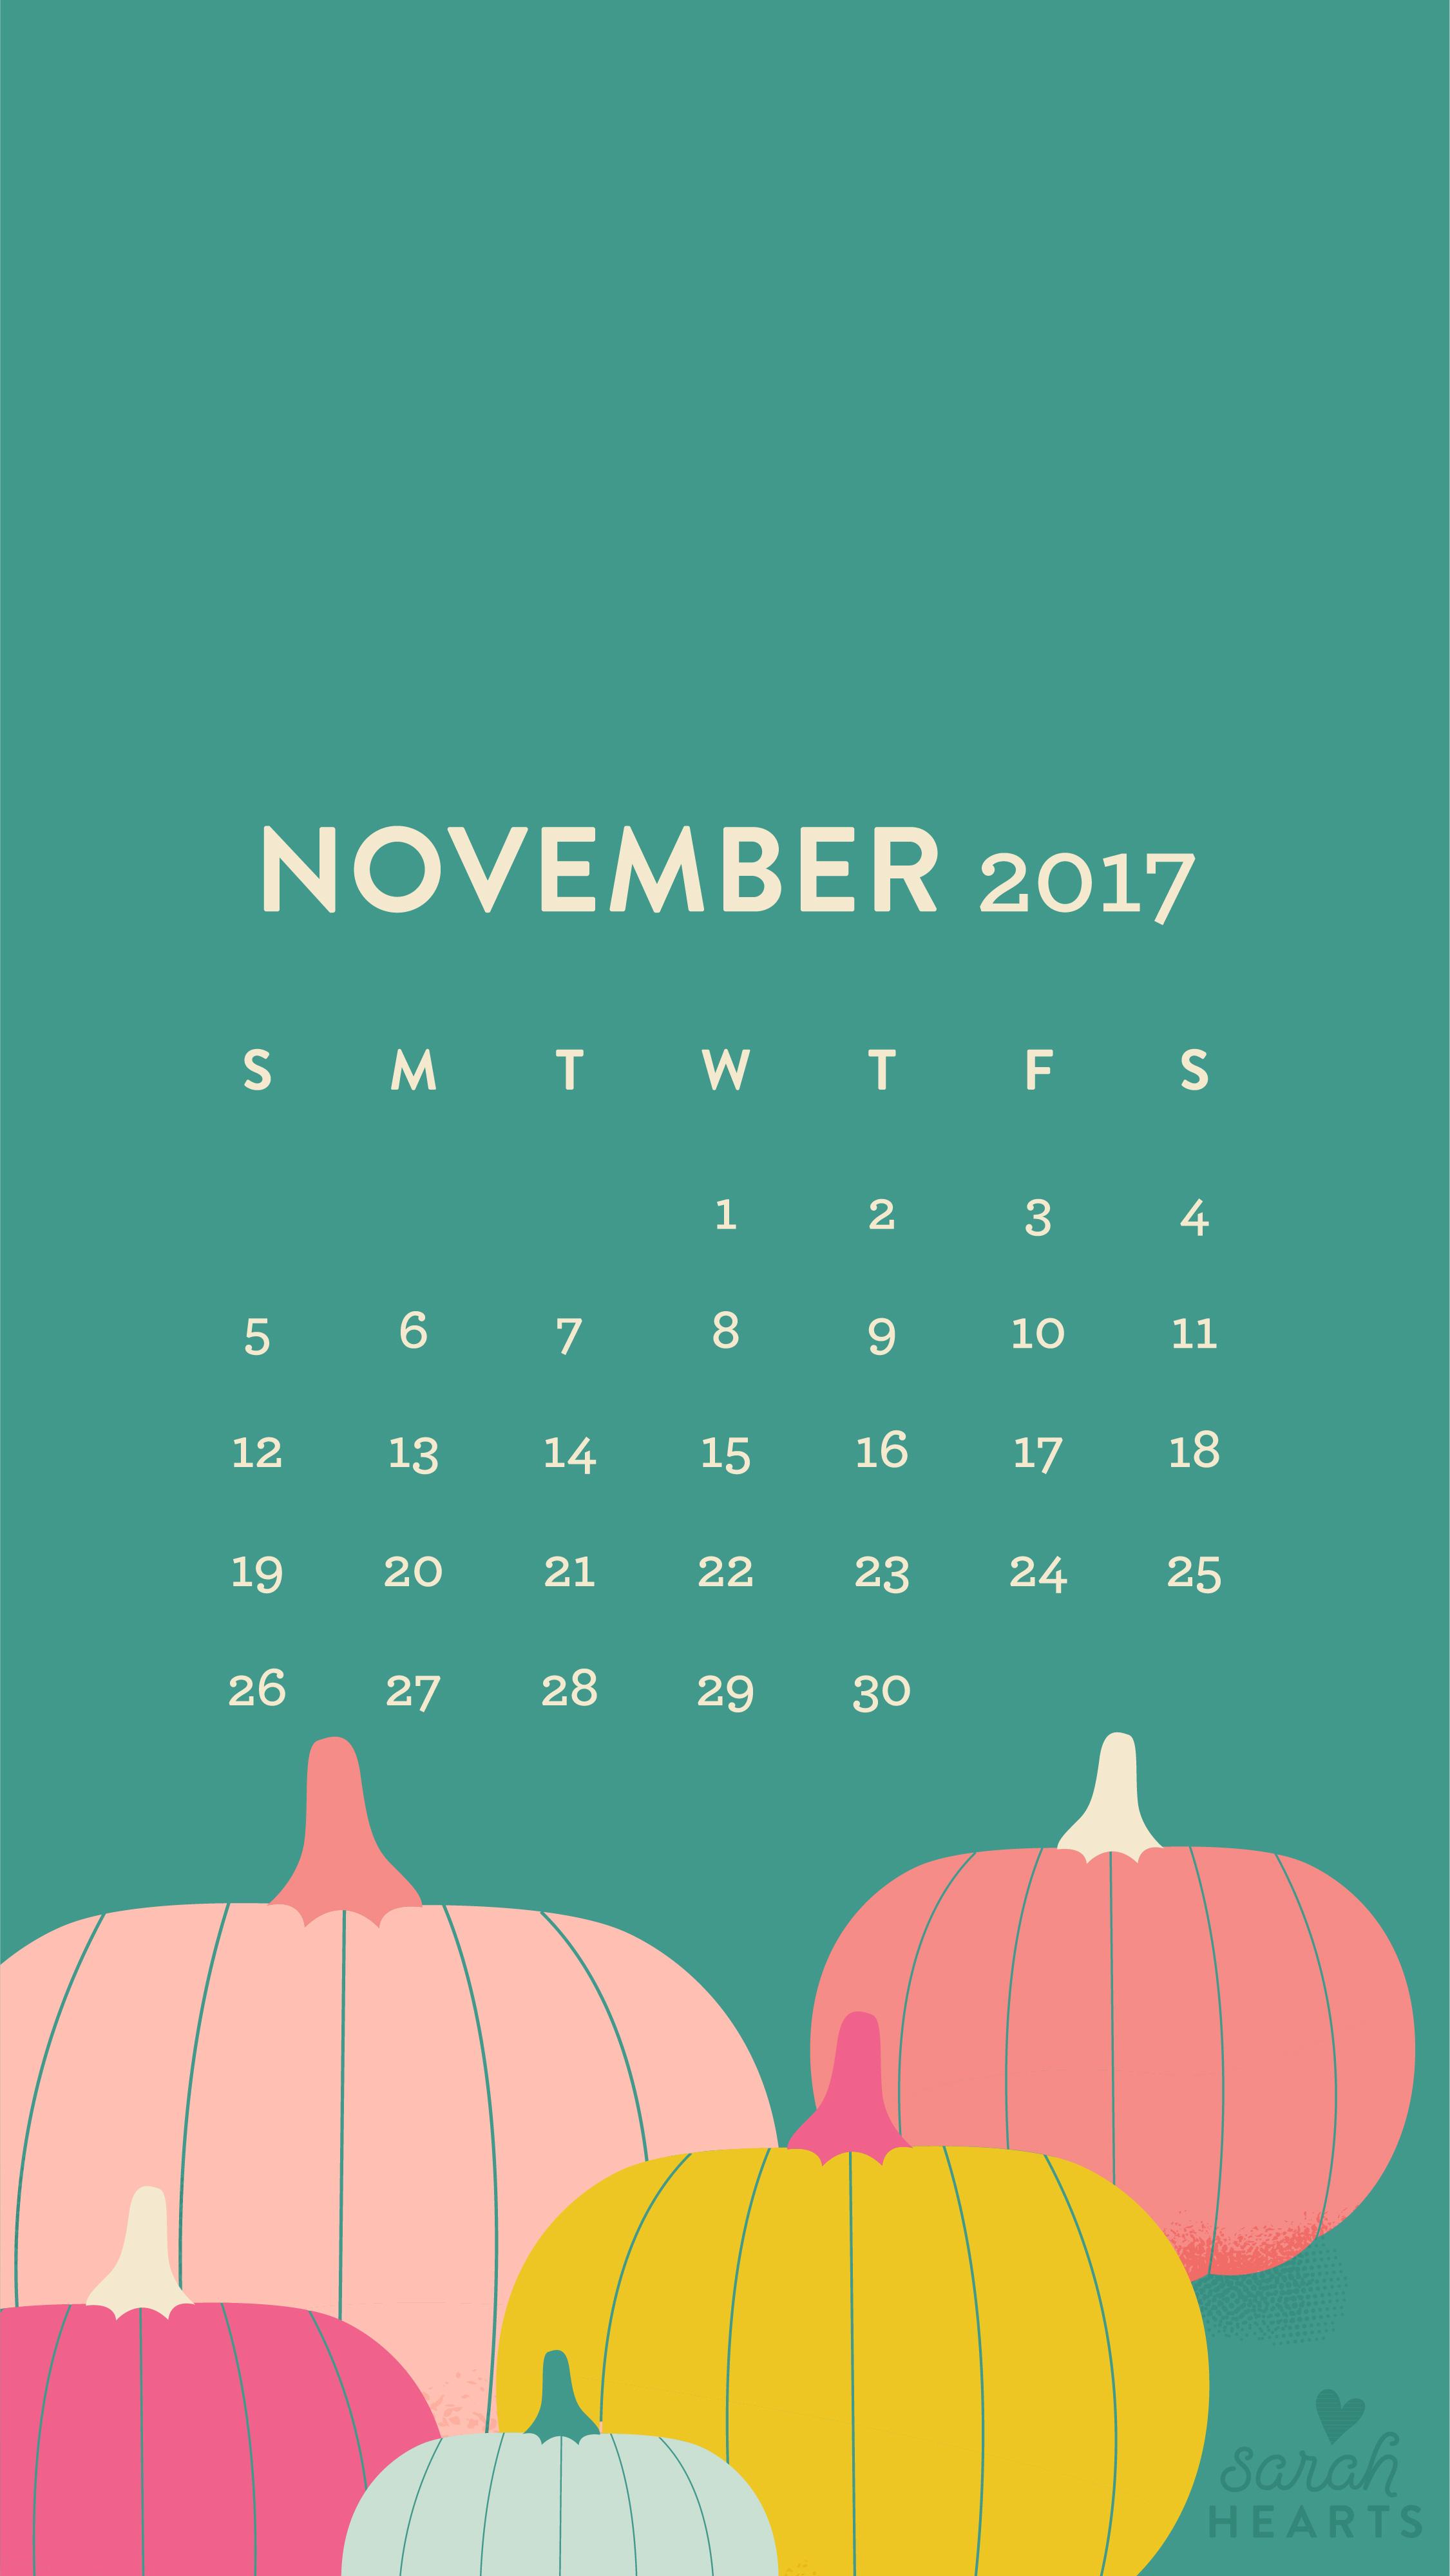 Wallpaper download of 2017 - Download The November Pumpkin Wallpaper